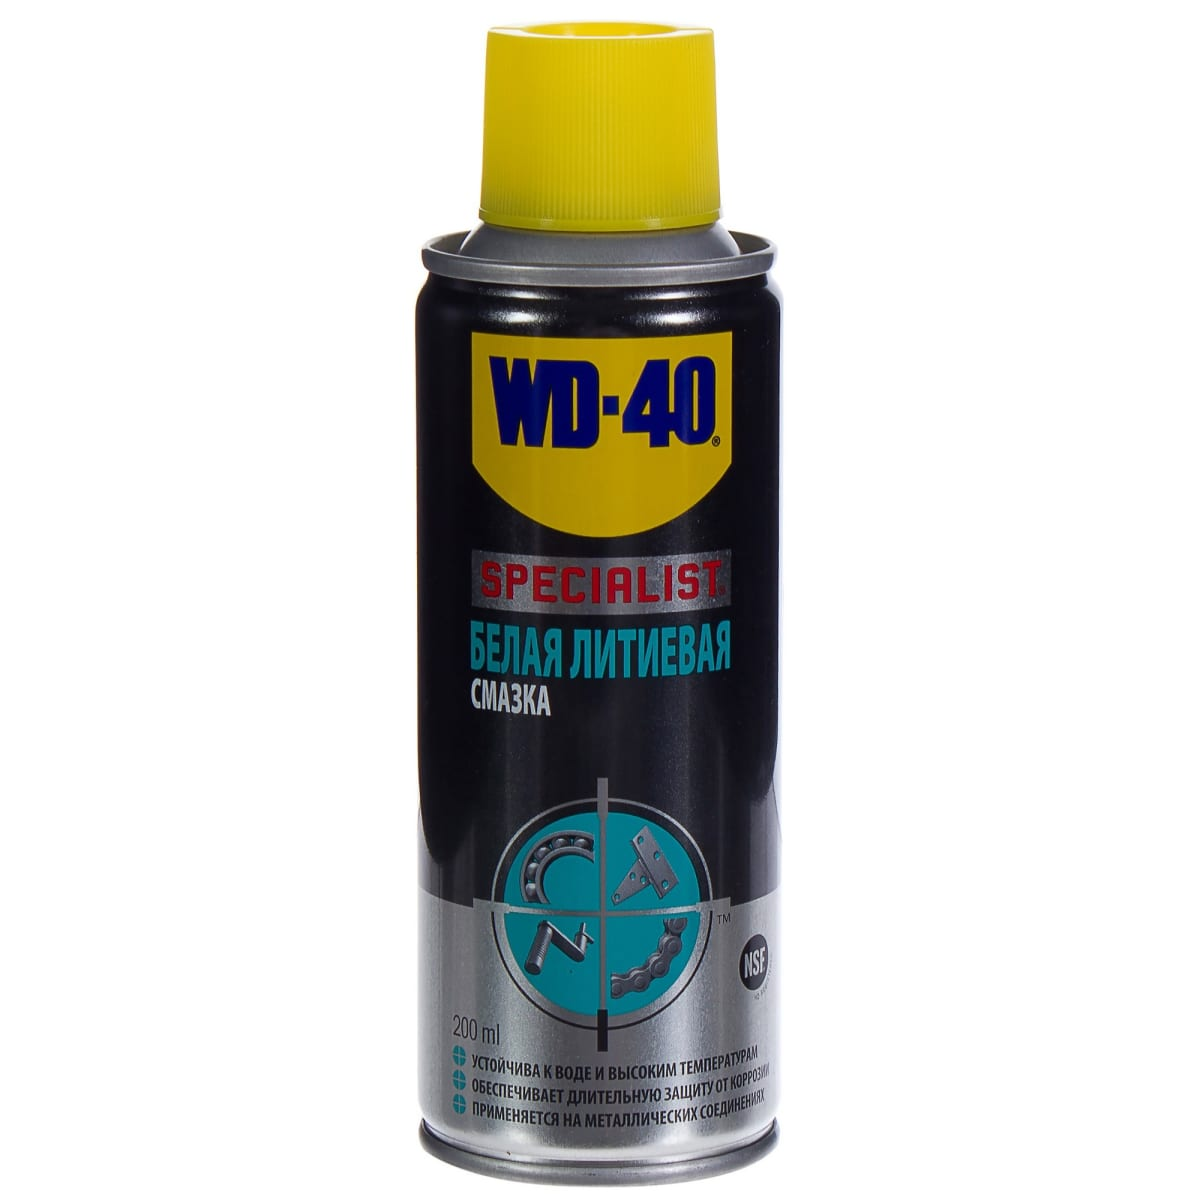 Смазка белая литиевая WD-40 Specialist, 200 мл